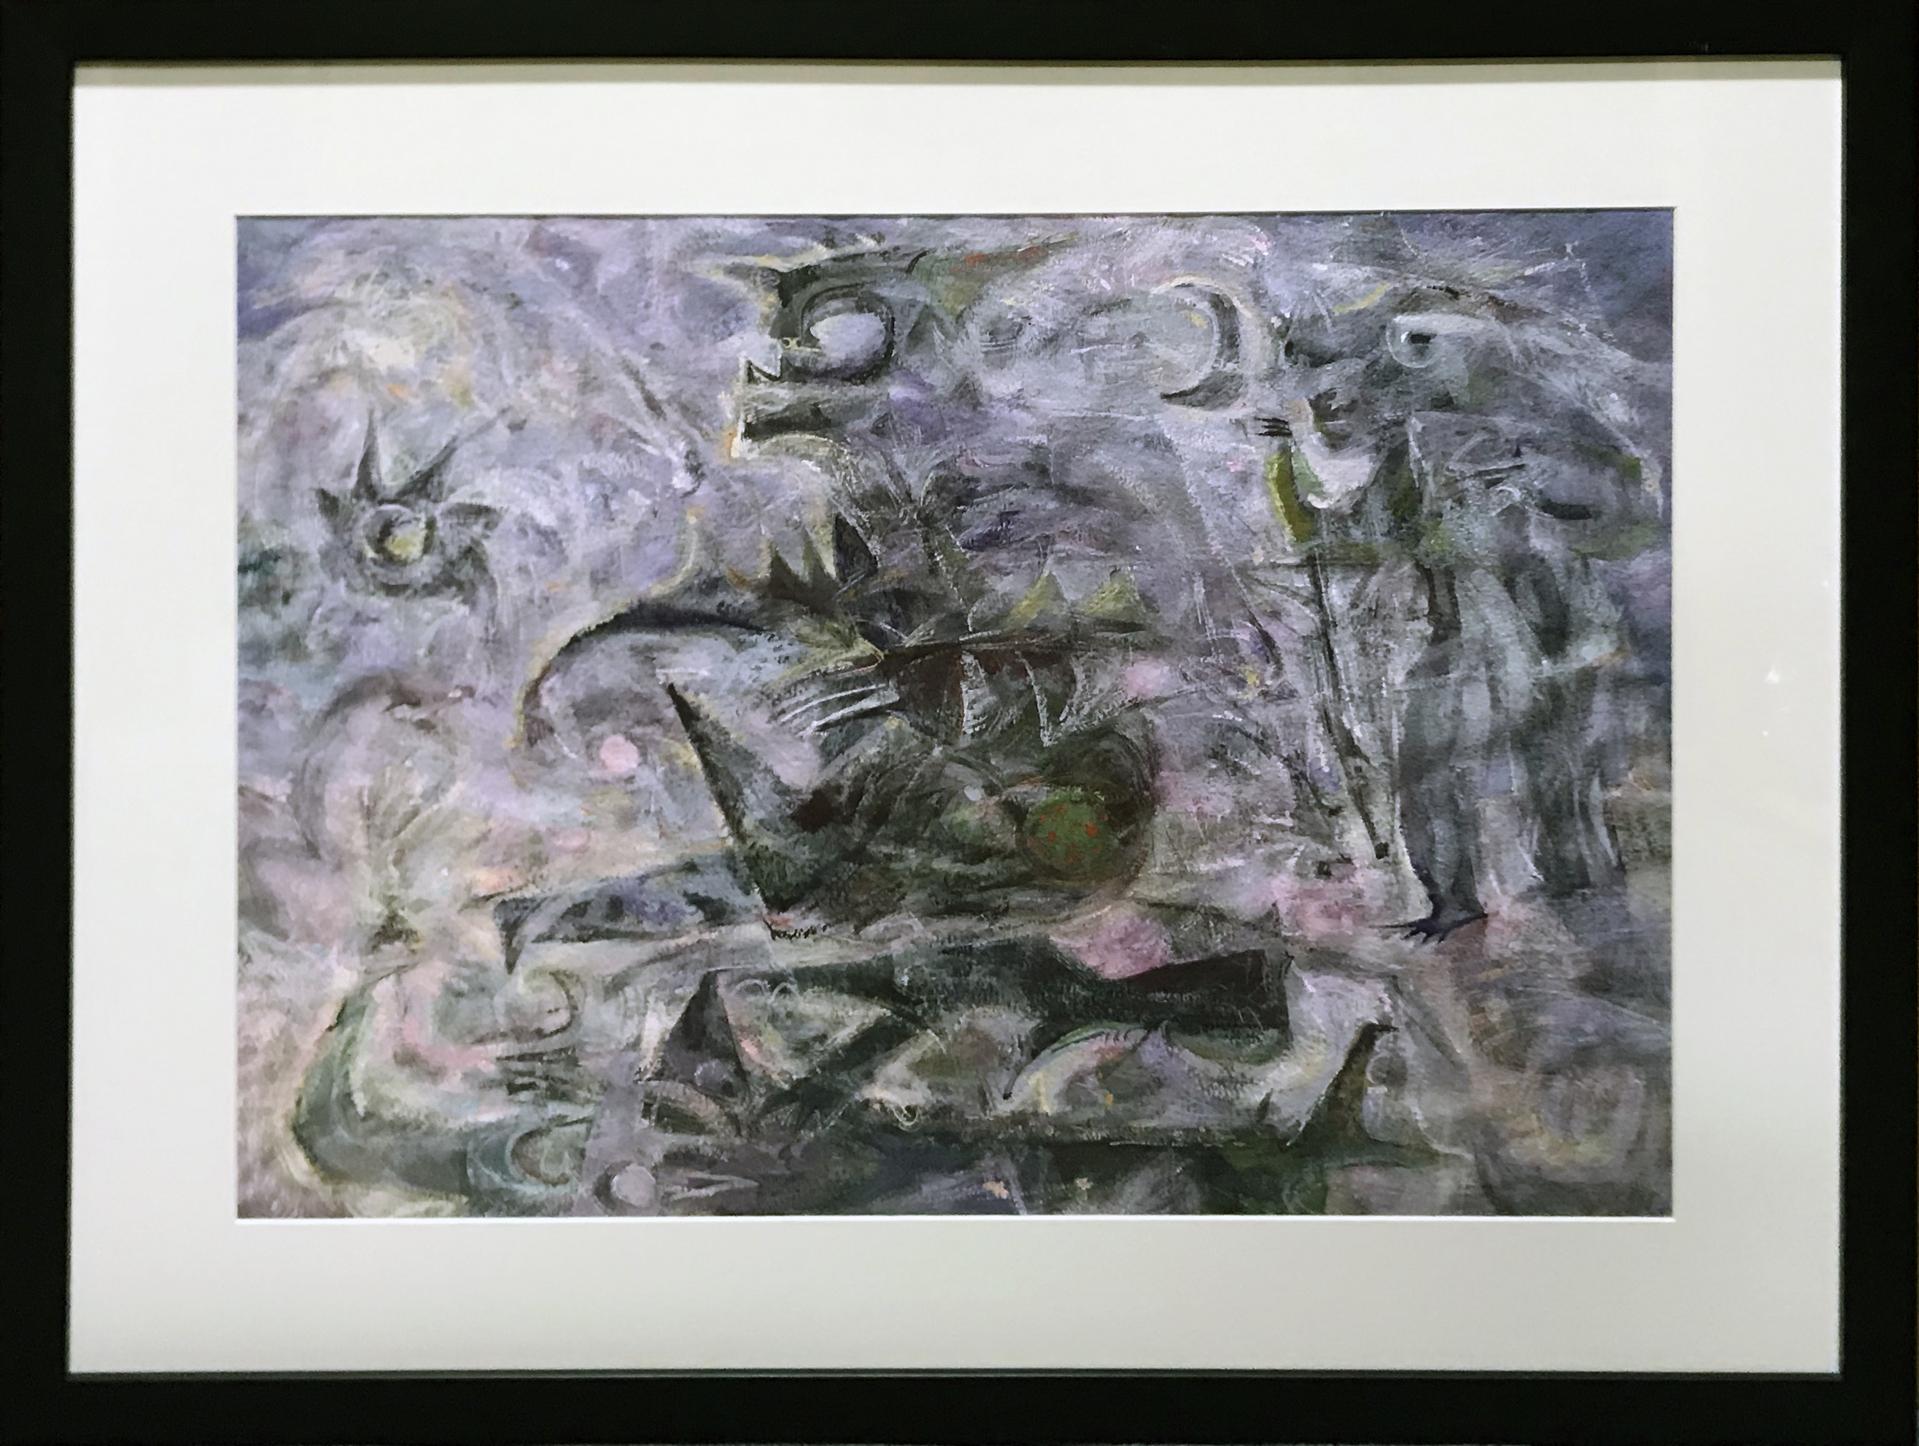 Mystic Fisherman by Bill Reily